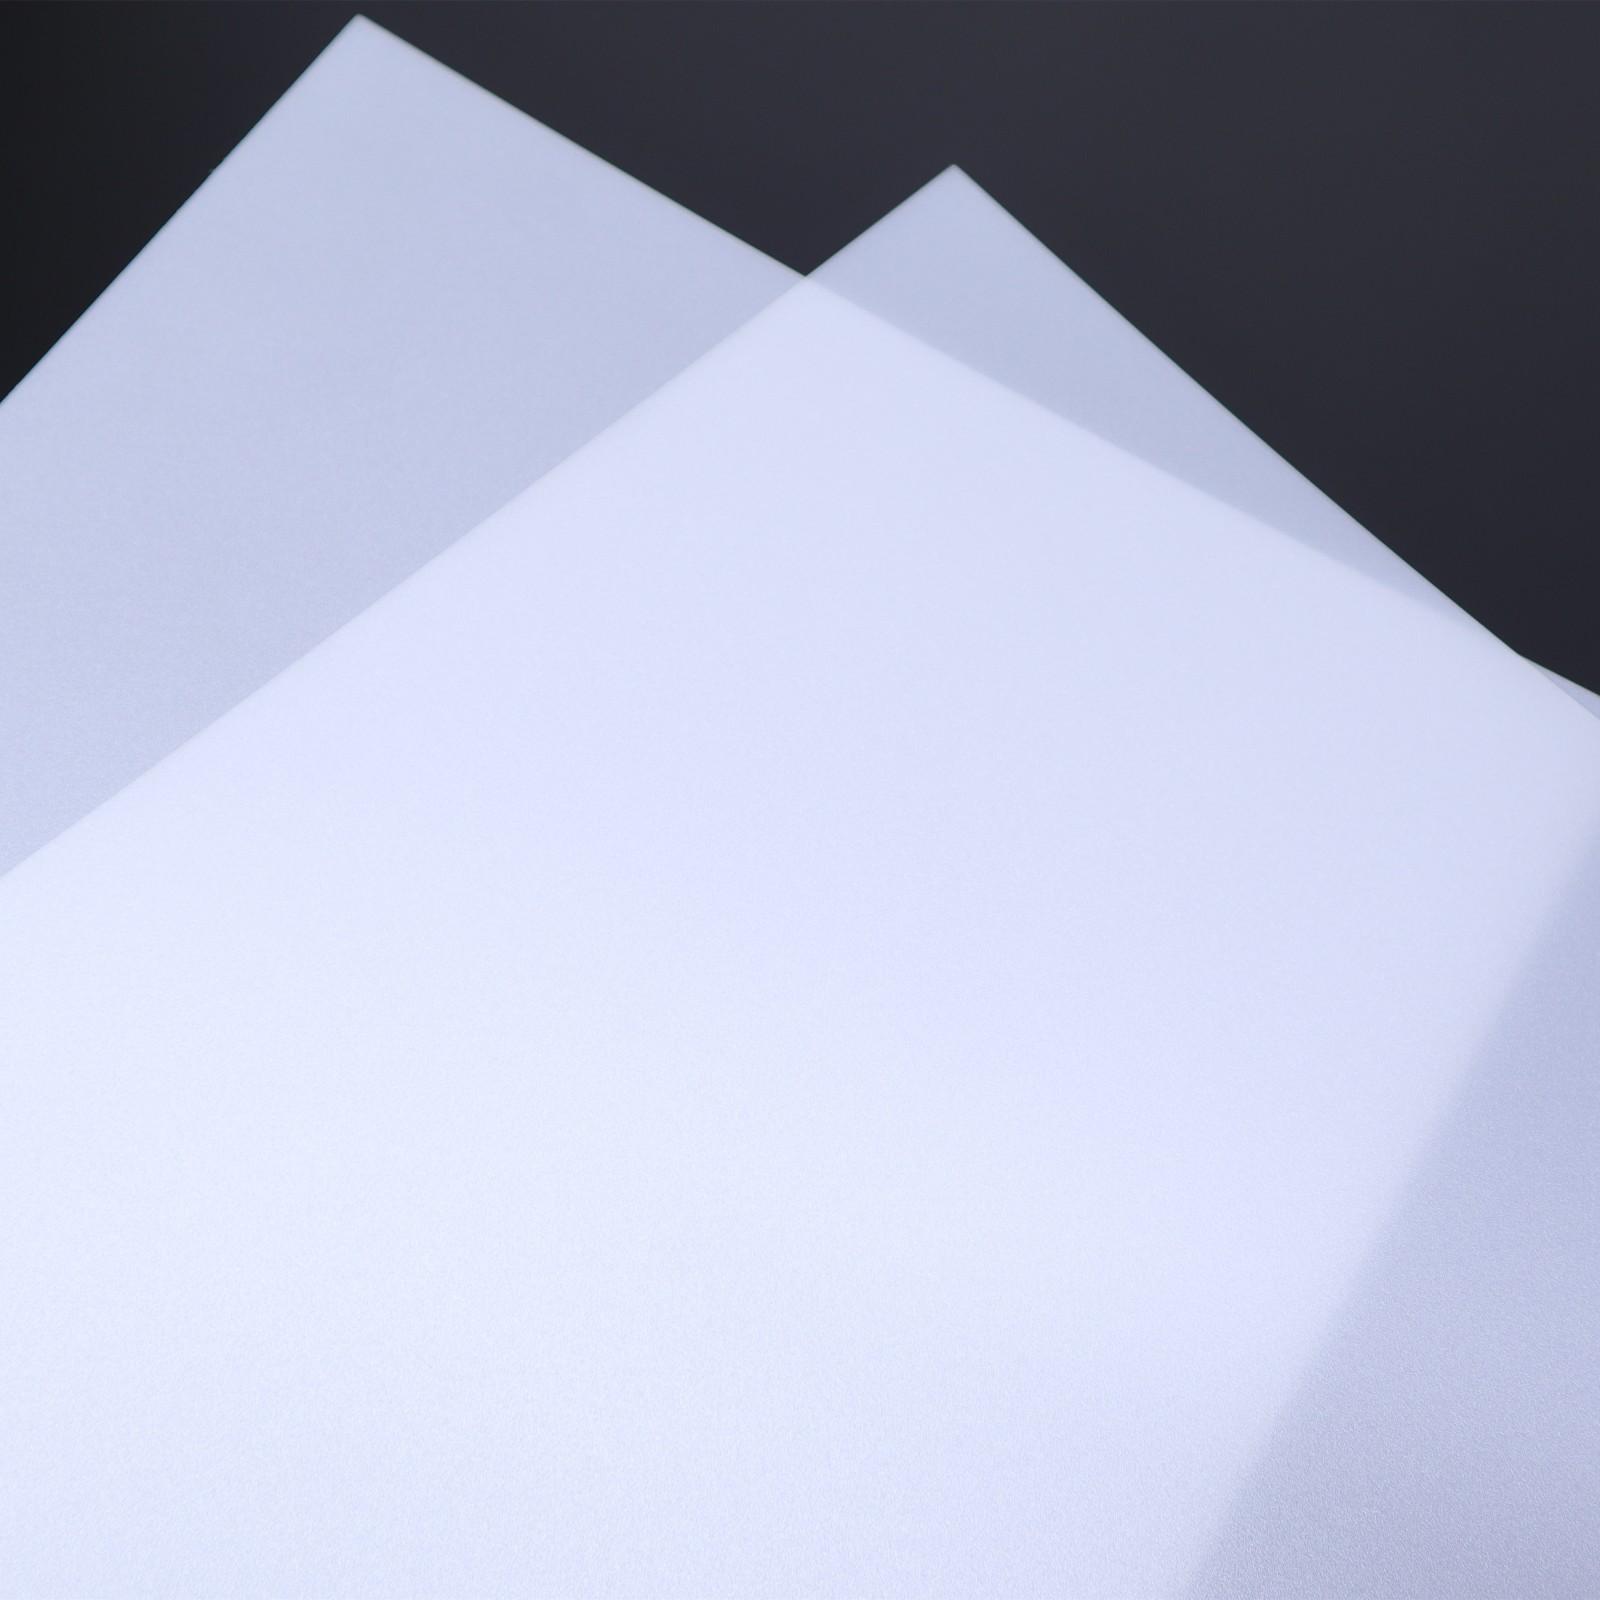 Cailong Transparent polycarbonate film directly sale for LED lighting-2